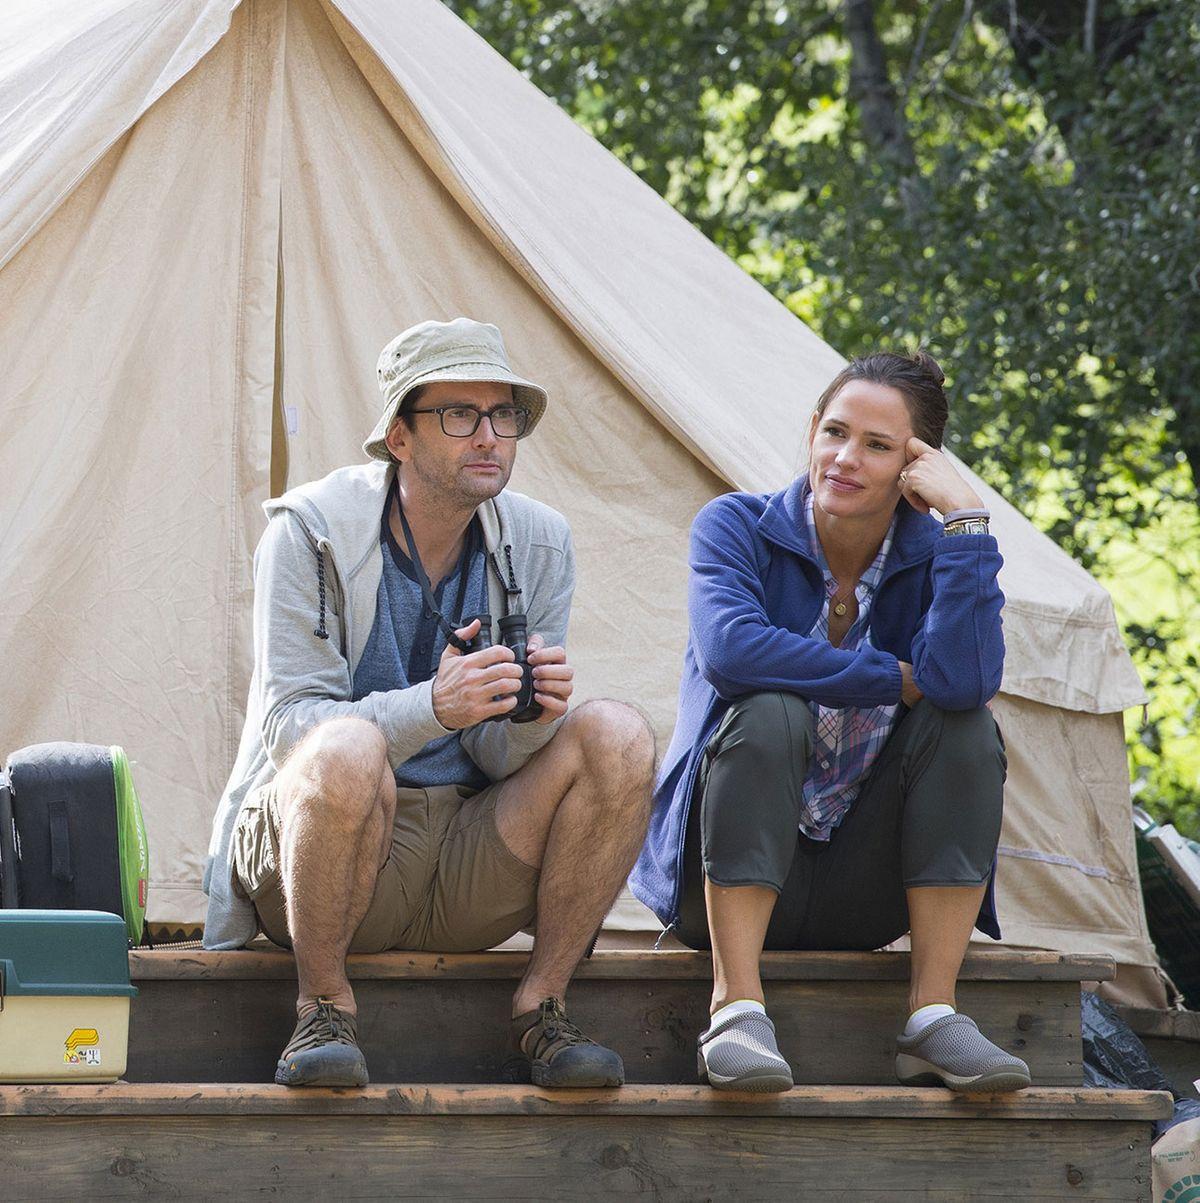 Ione Skye Camping photo 22